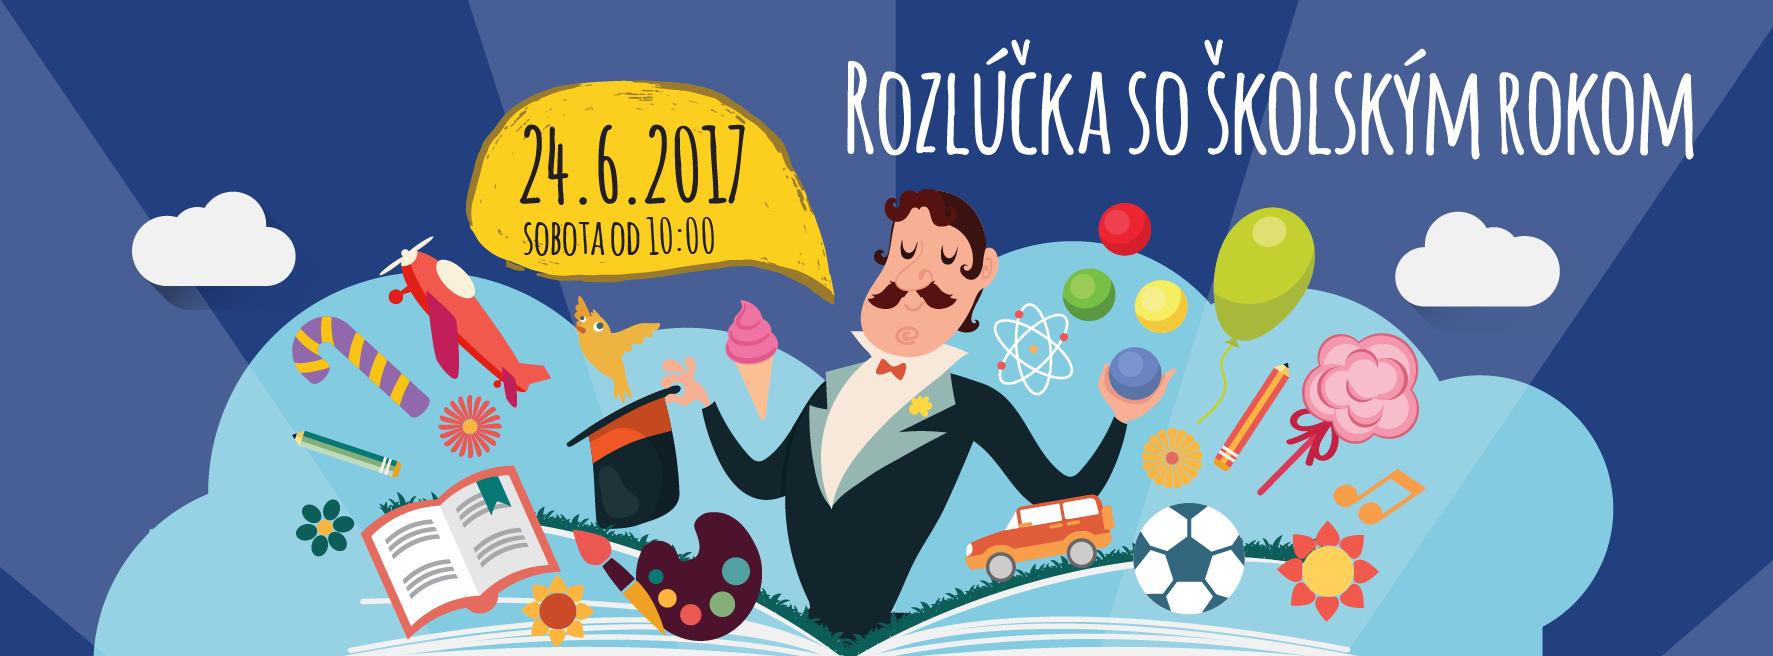 fb_cover_rozlucka-01